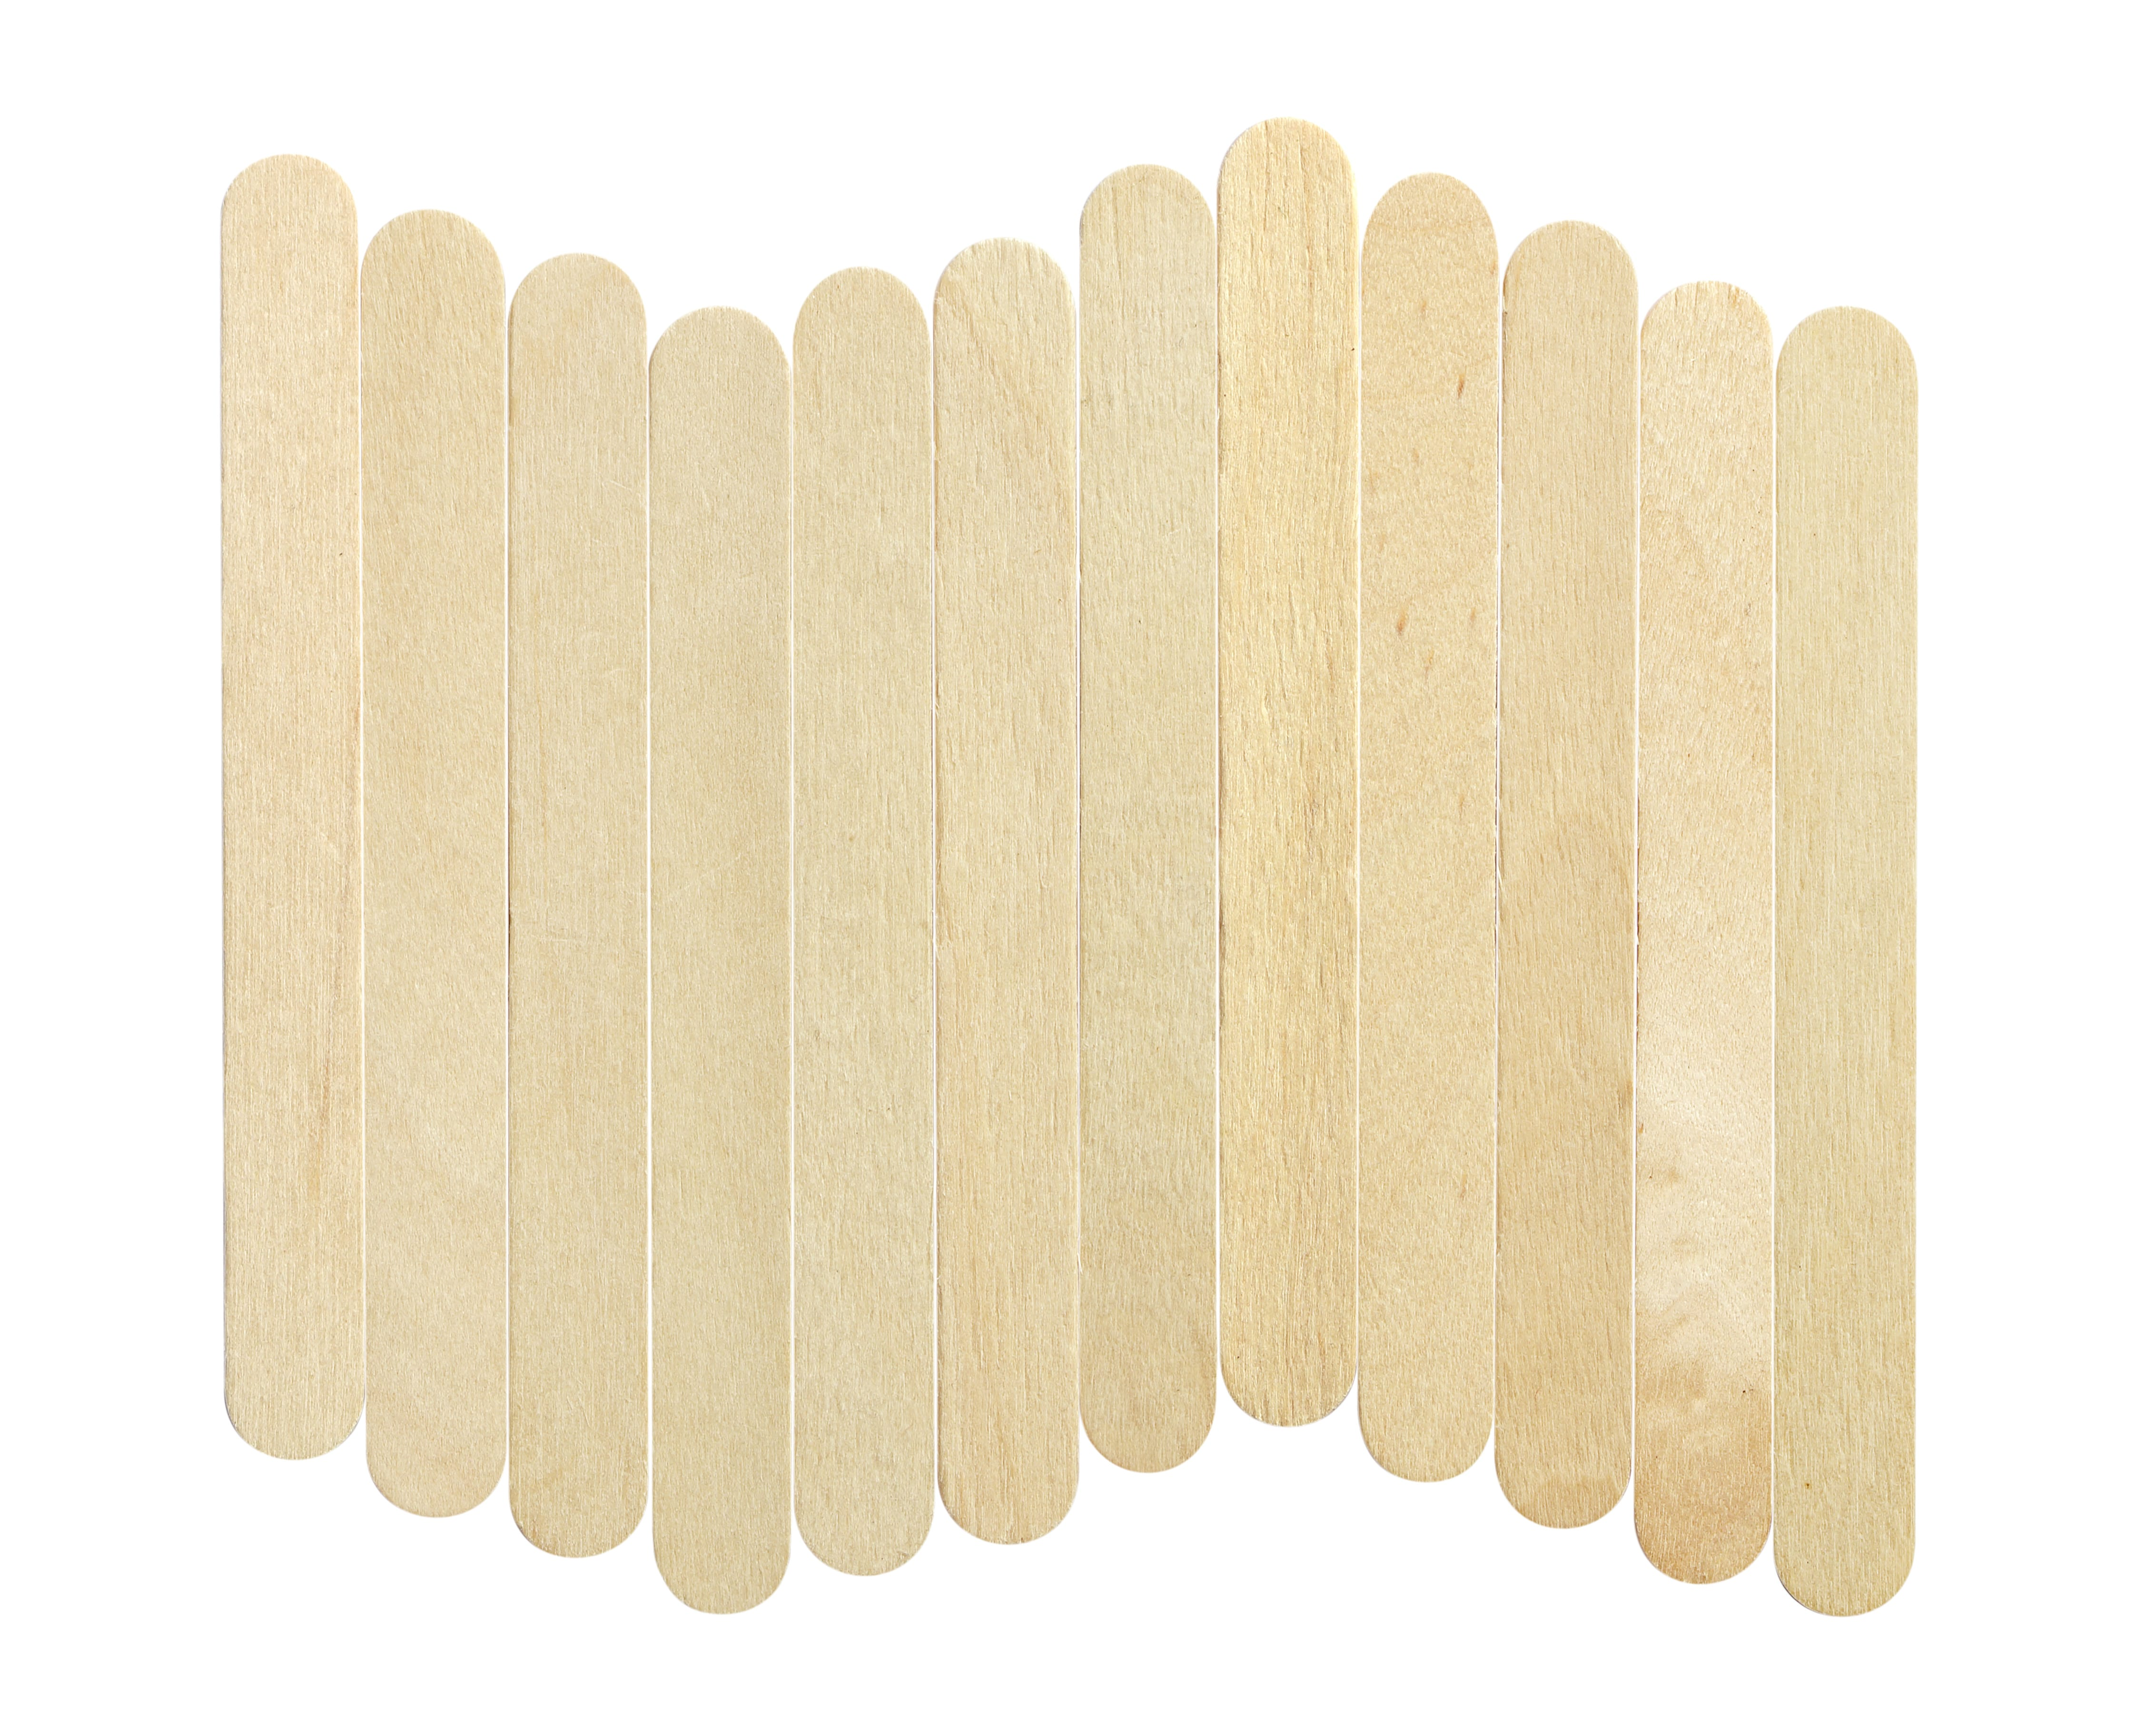 Ice lolly sticks, Ice cream sticks, isolated on white background